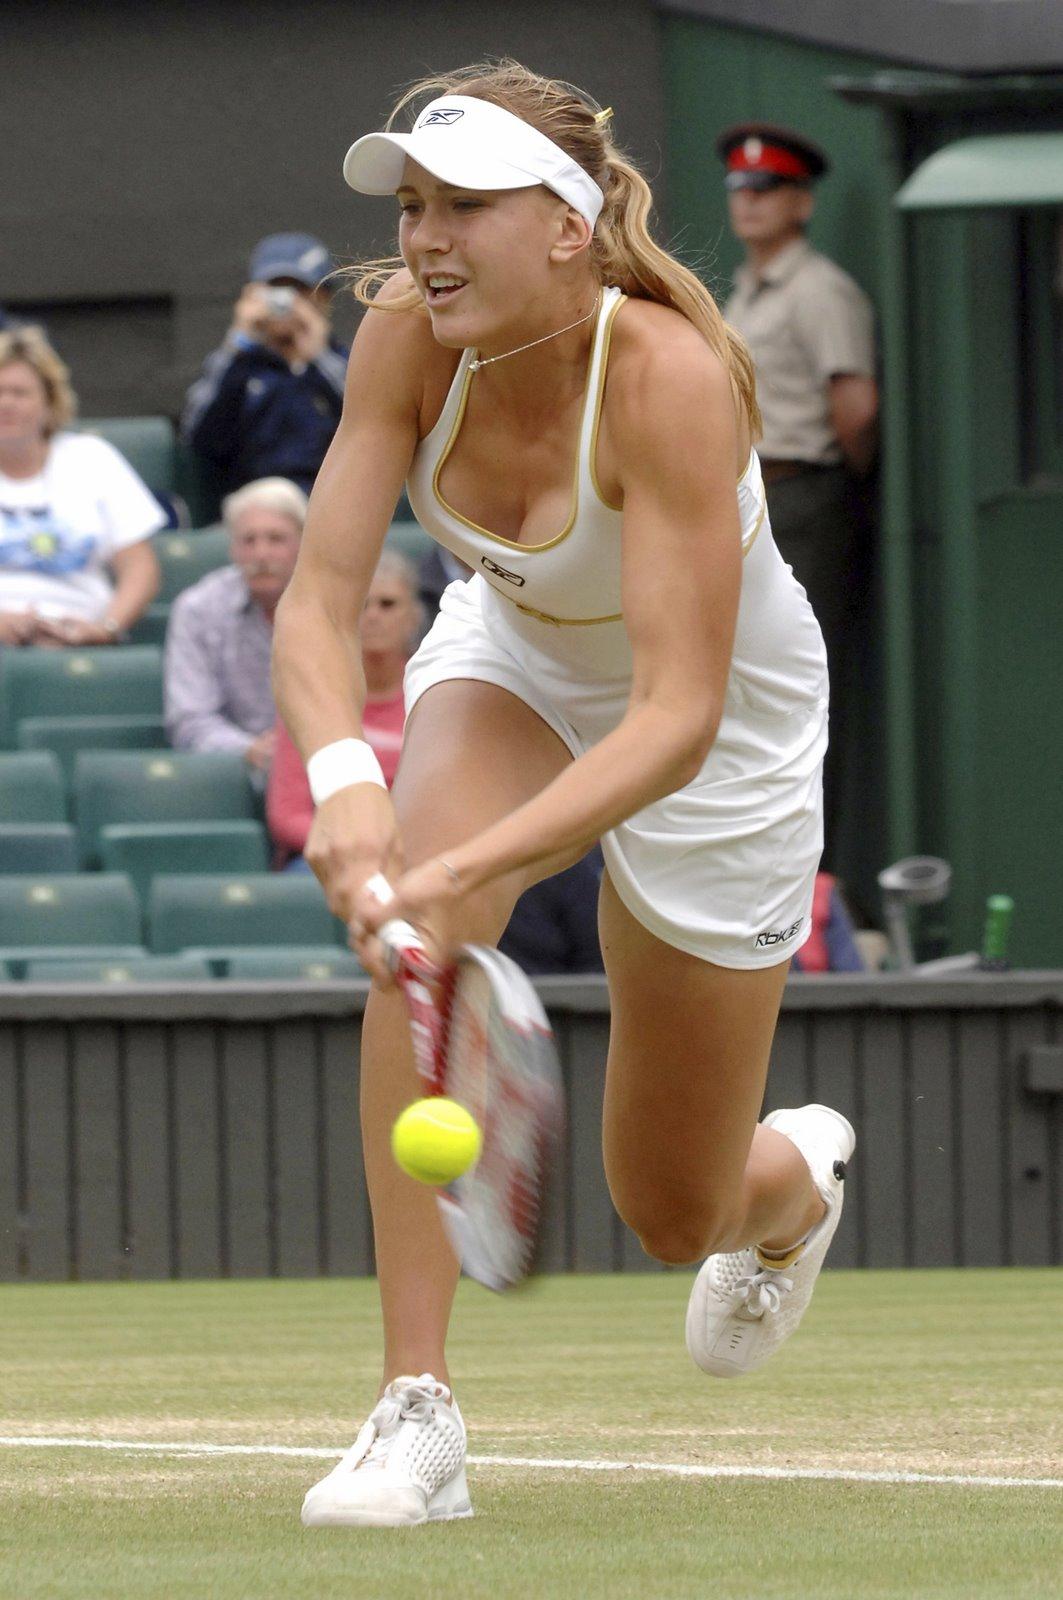 nicole vaidisova tennis girl Chico's Angels at WEHO Gay